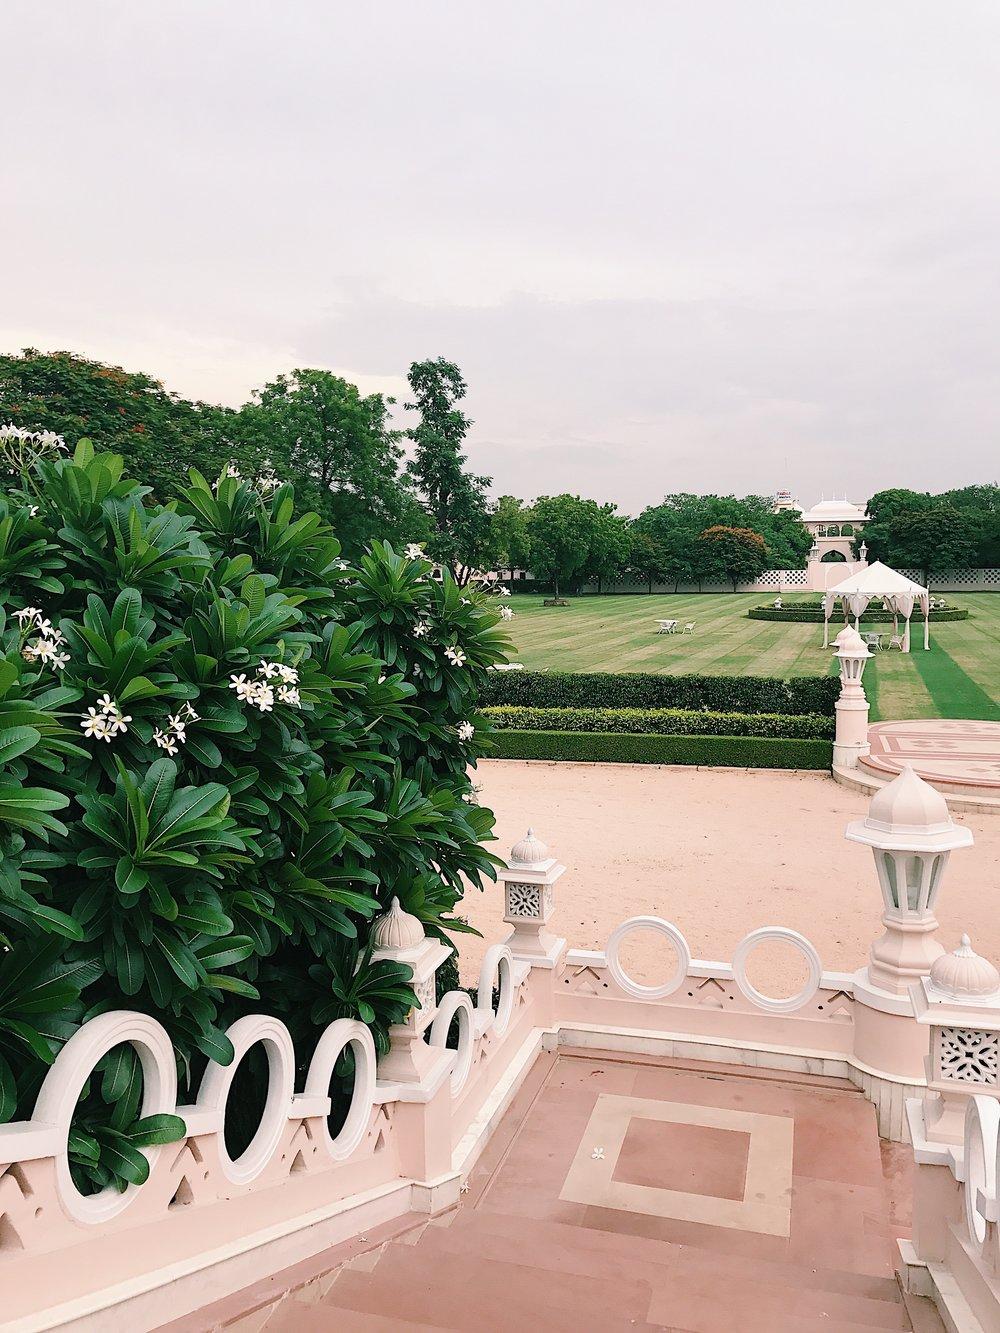 Wondering the Gardens